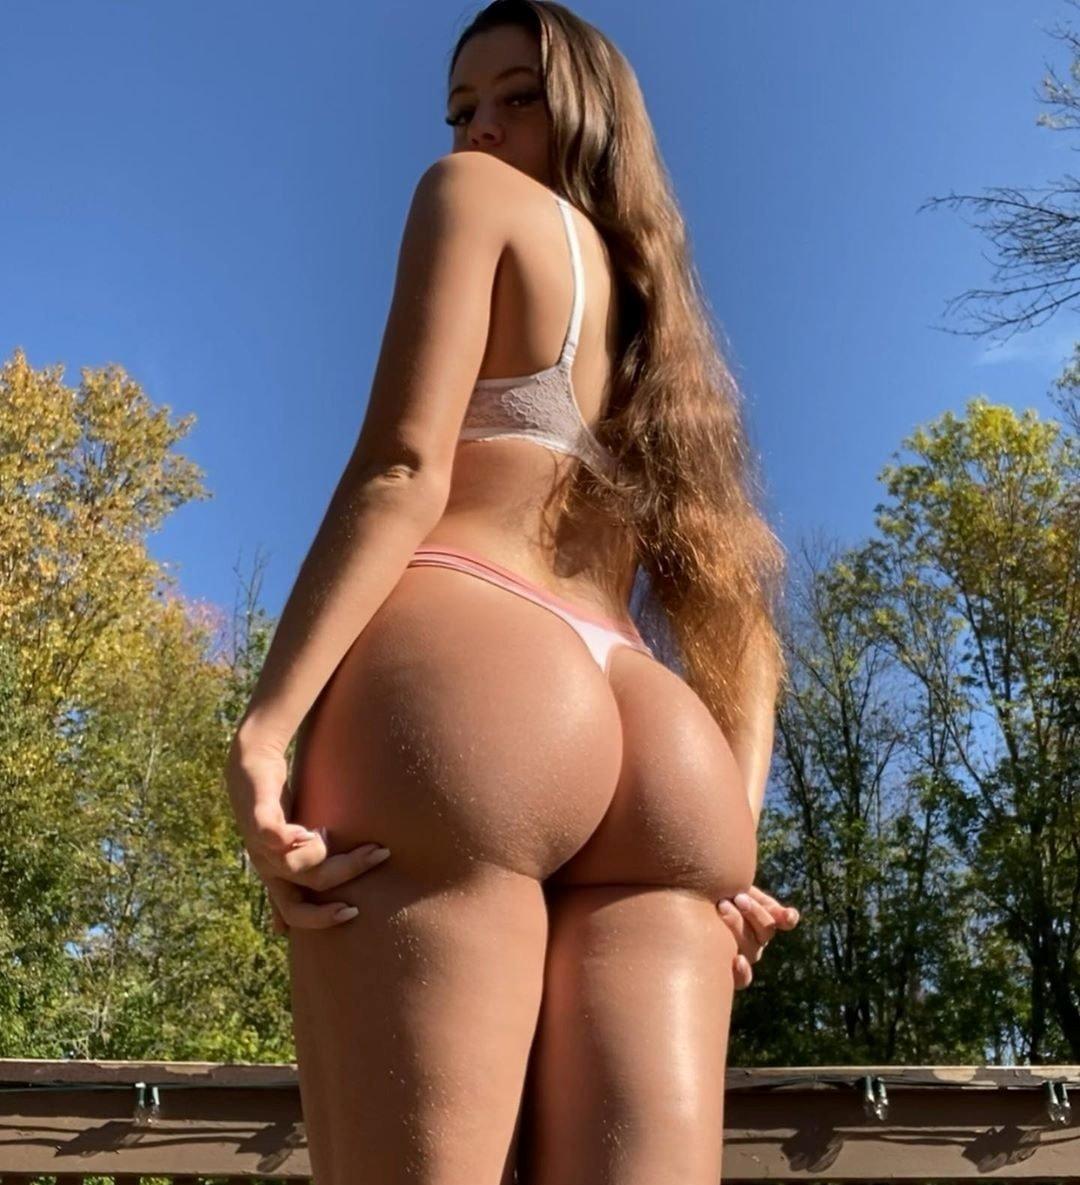 Jakara Mitchell Karamitch Onlyfans Nude Leaks 0010